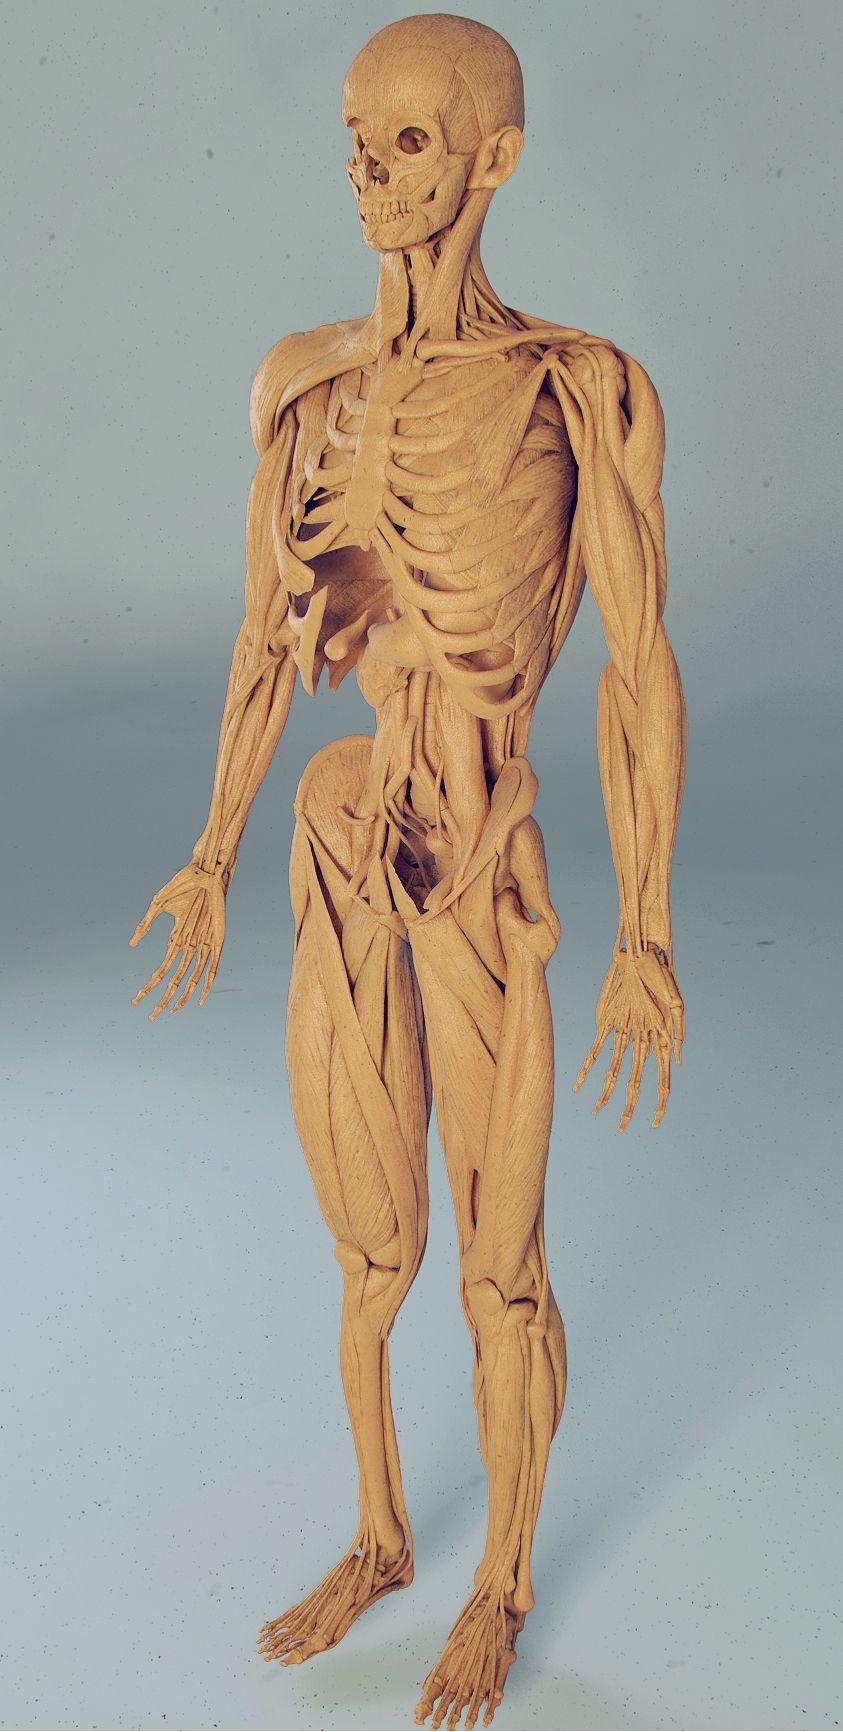 Full anatomy model free download - CGFeedback | Animation